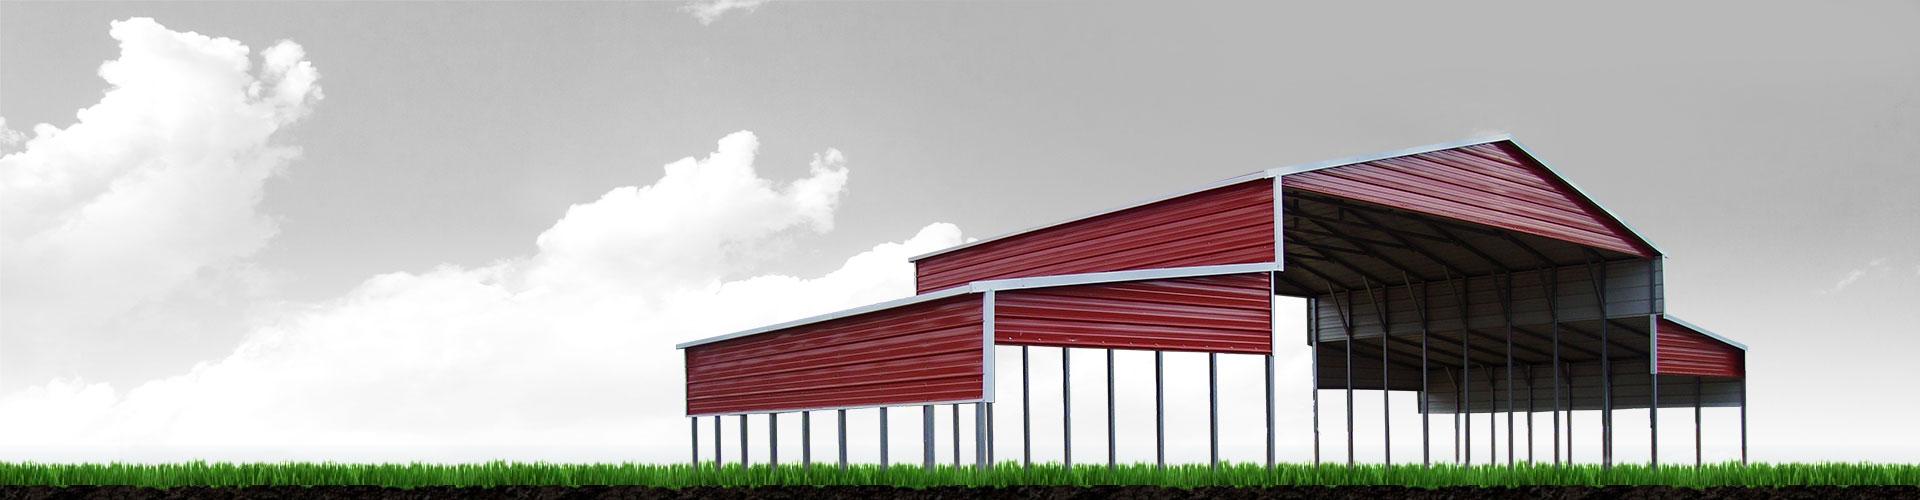 barns carports barn garages horse edited end red metal gatorback kits on corvette sale